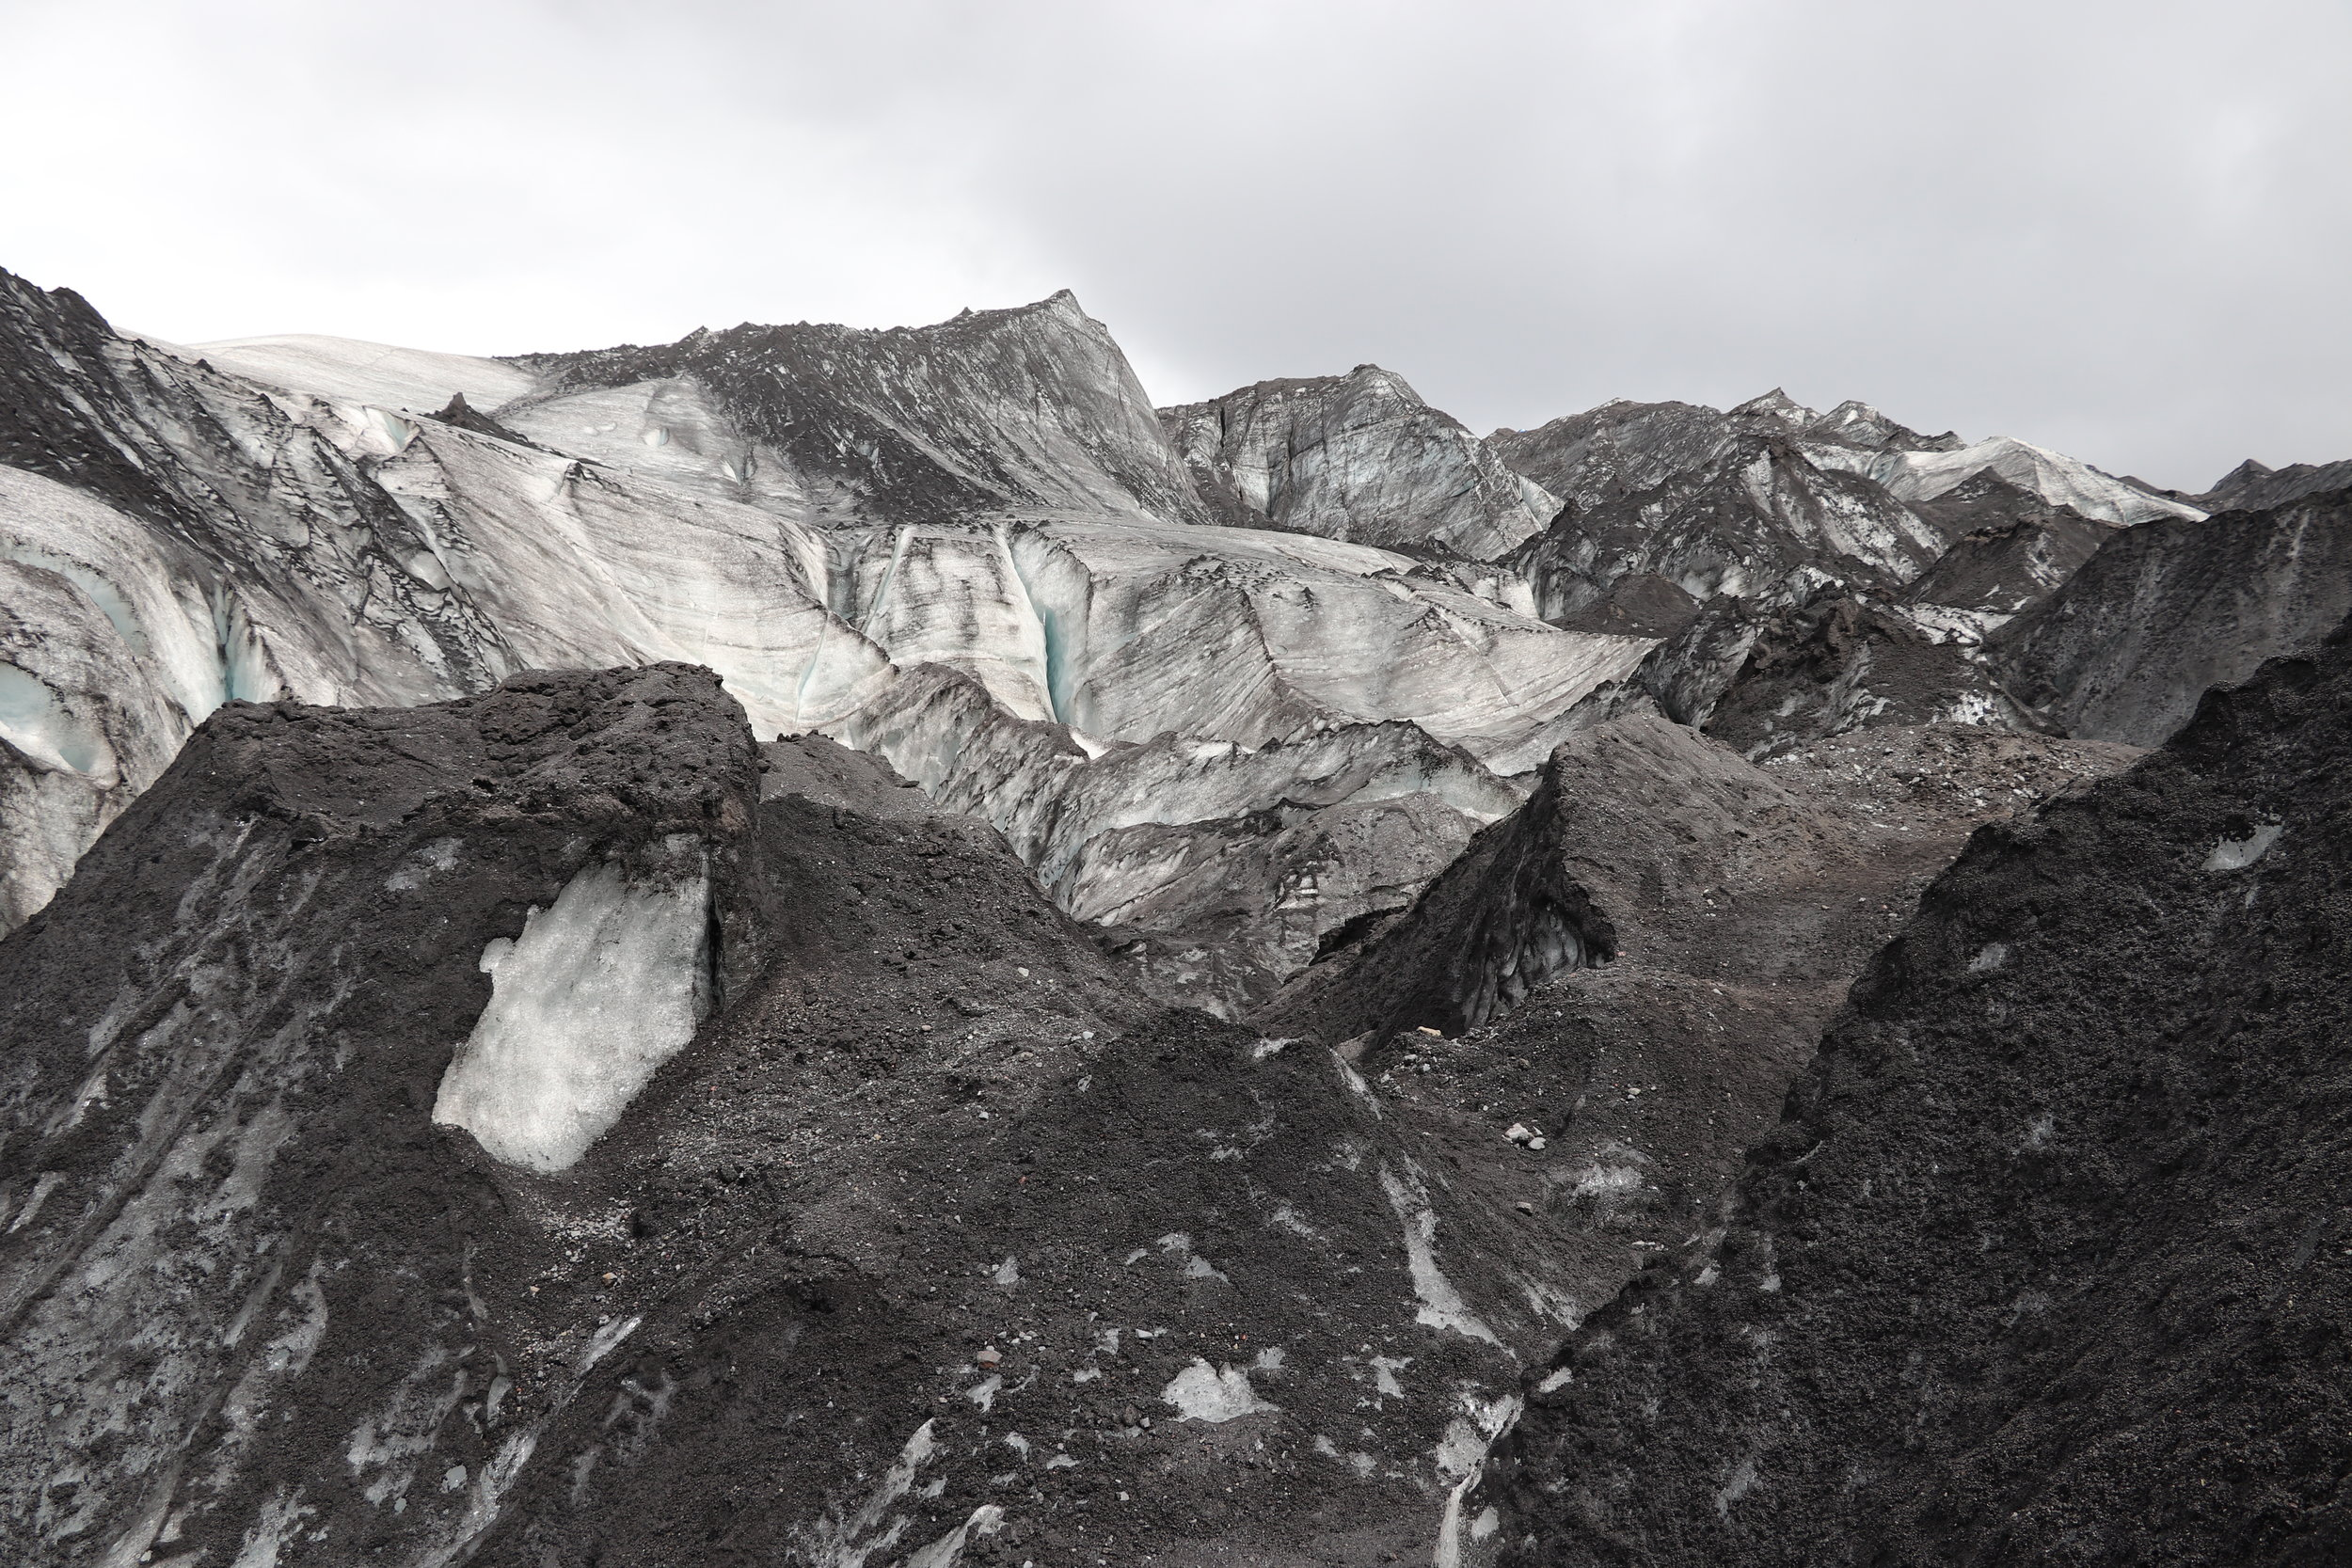 iceland-glacier-ash-landscape-photograph-funkhouser